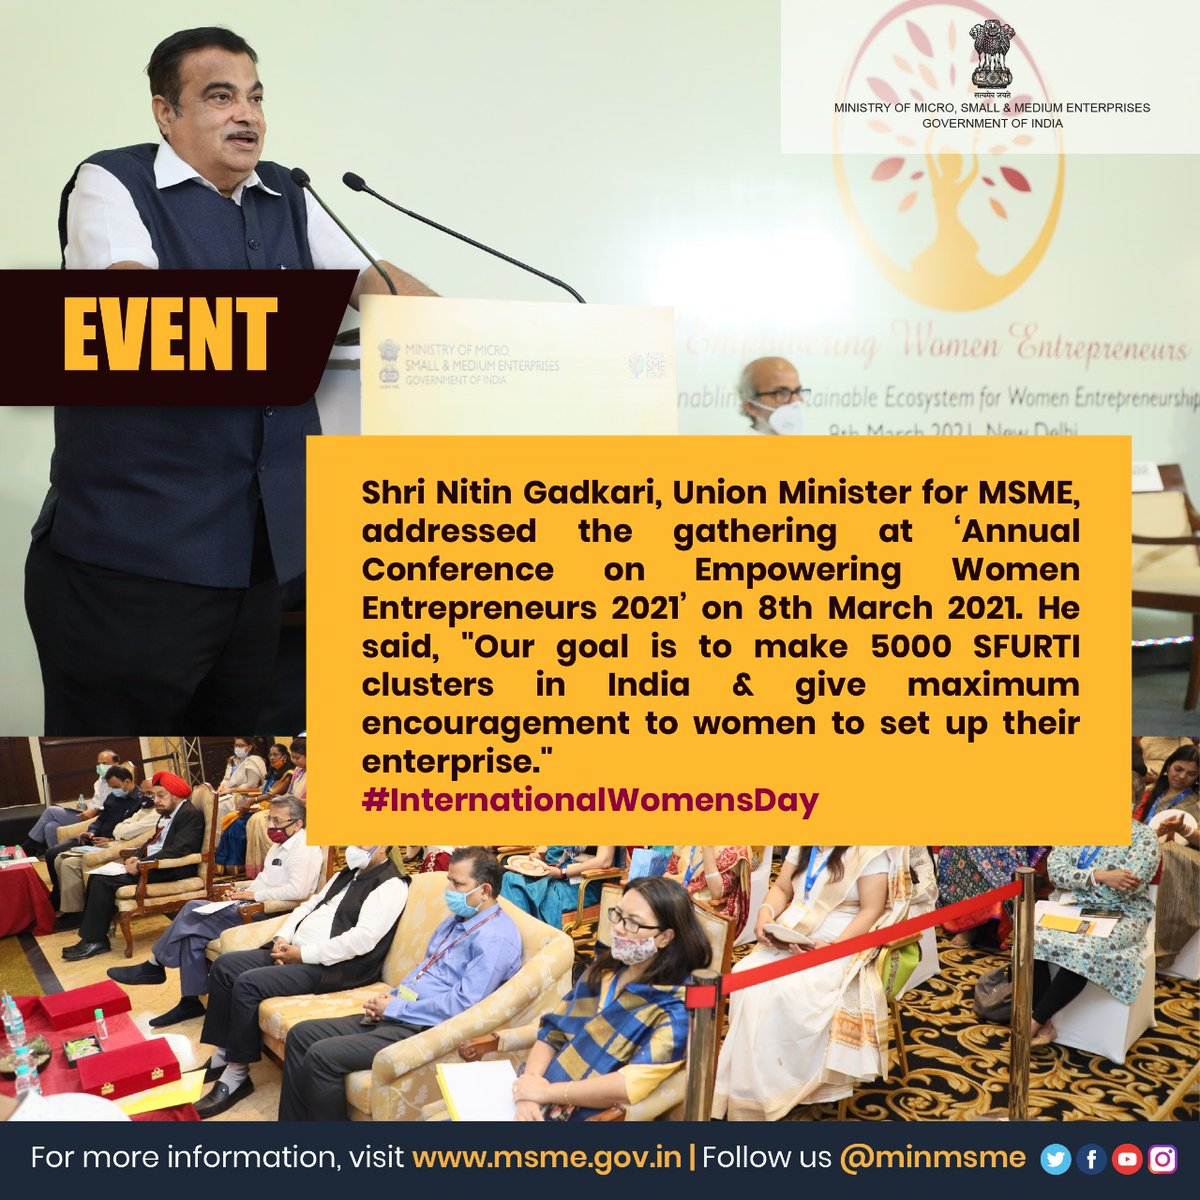 Shri Nitin Gadkari, Union Minister for MSME, addressing the women entrepreneurs at the 'Annual Conference on Empowering Women Entrepreneurs 2021' on 8th March 2021. #InternationalWomensDay2021 #MSME